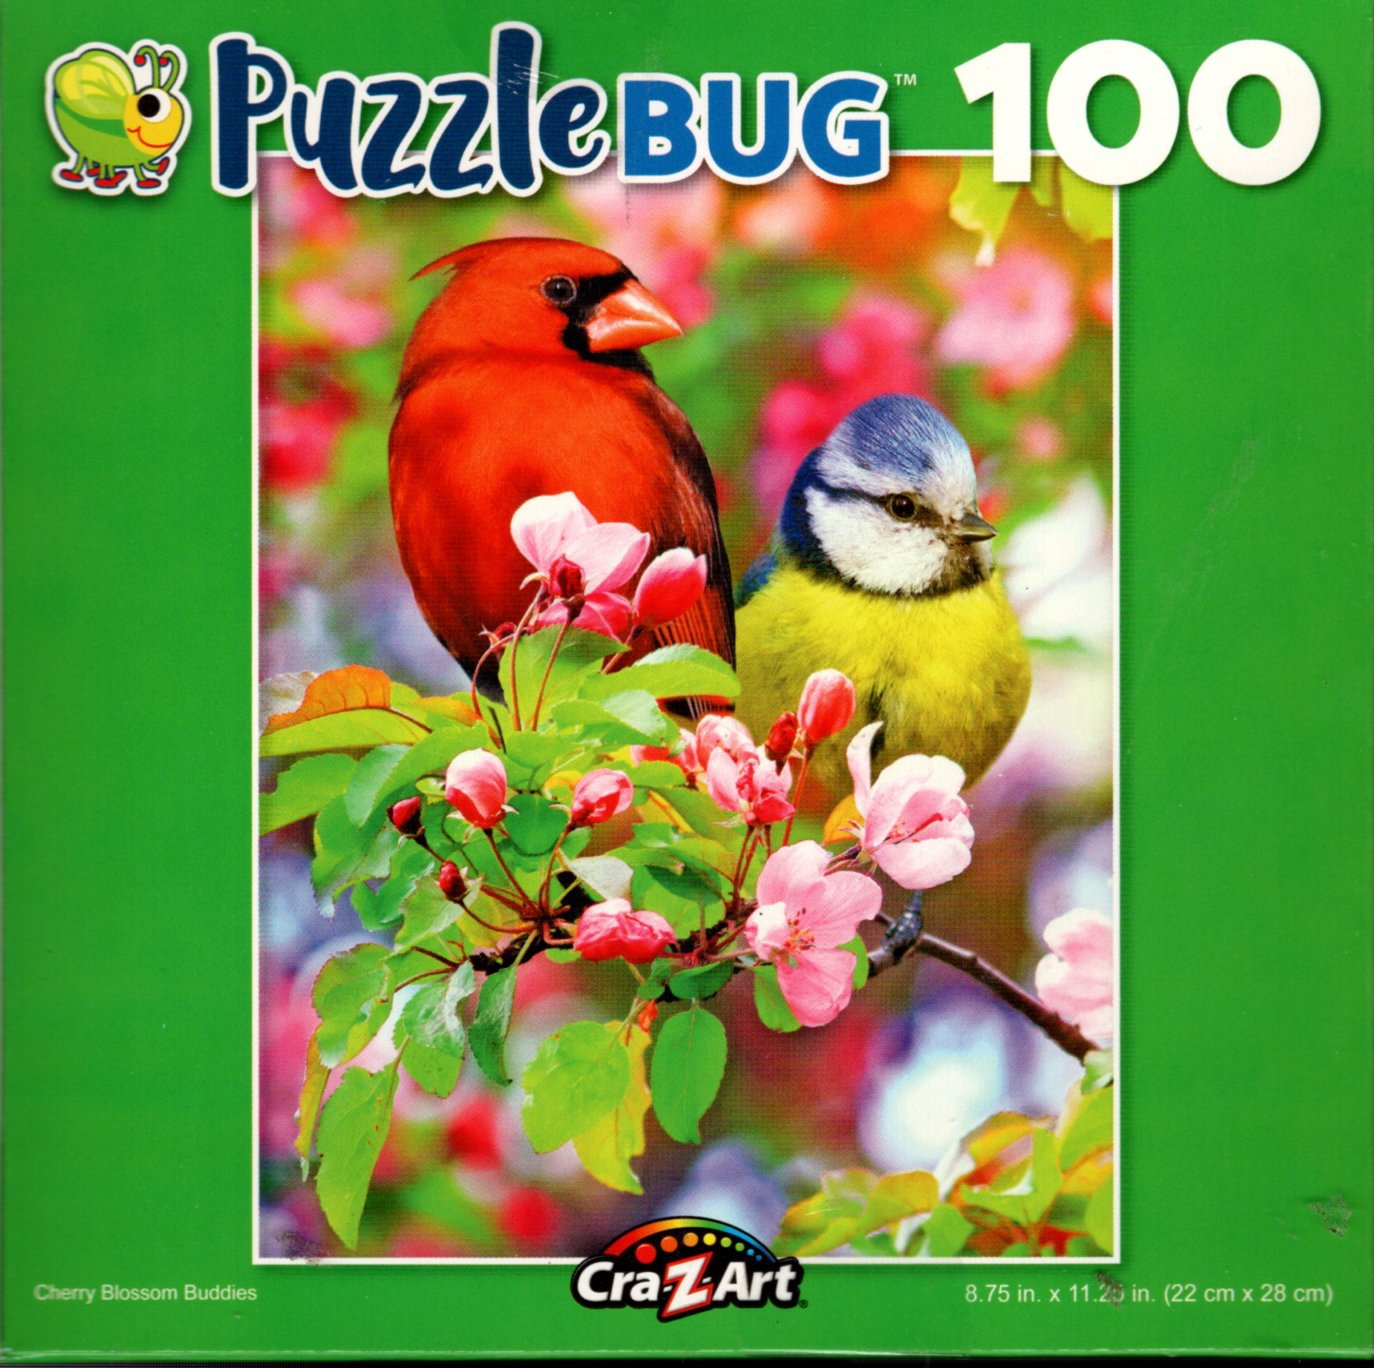 Cherry Blossom Buddies - 100 Piece Jigsaw Puzzle